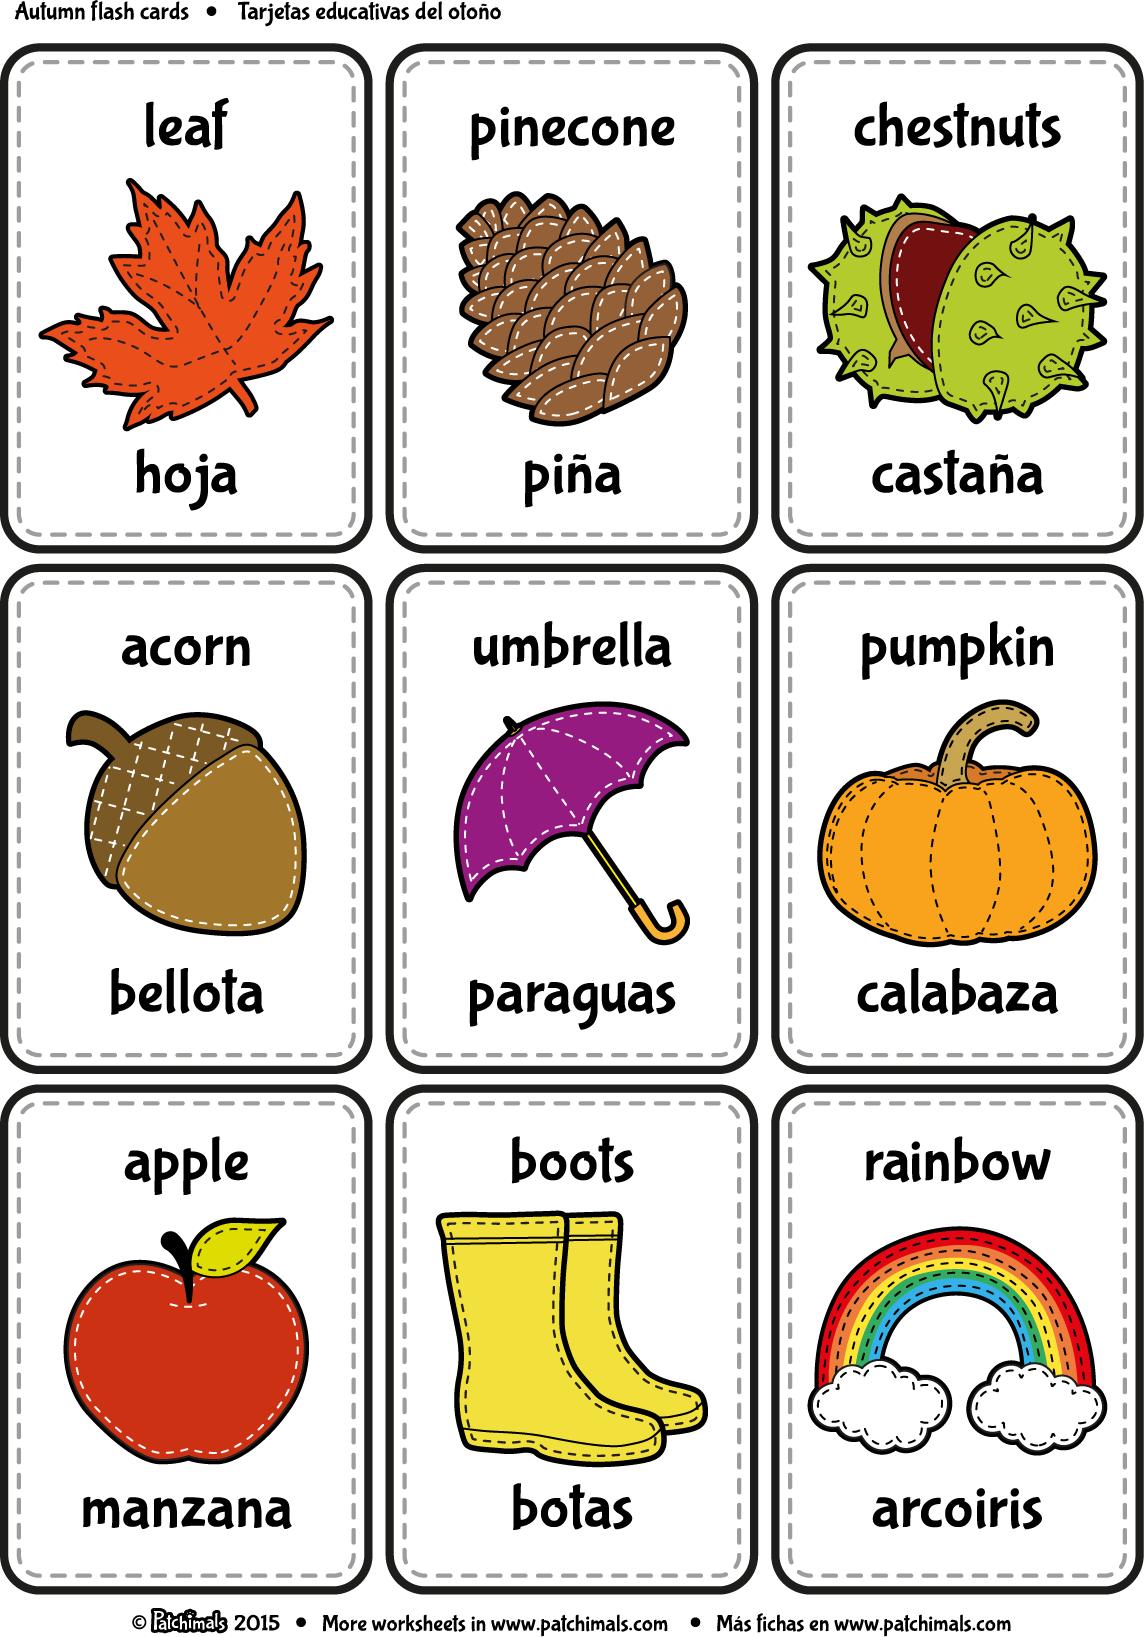 Imagen Bingo Vegetales Para Recortar